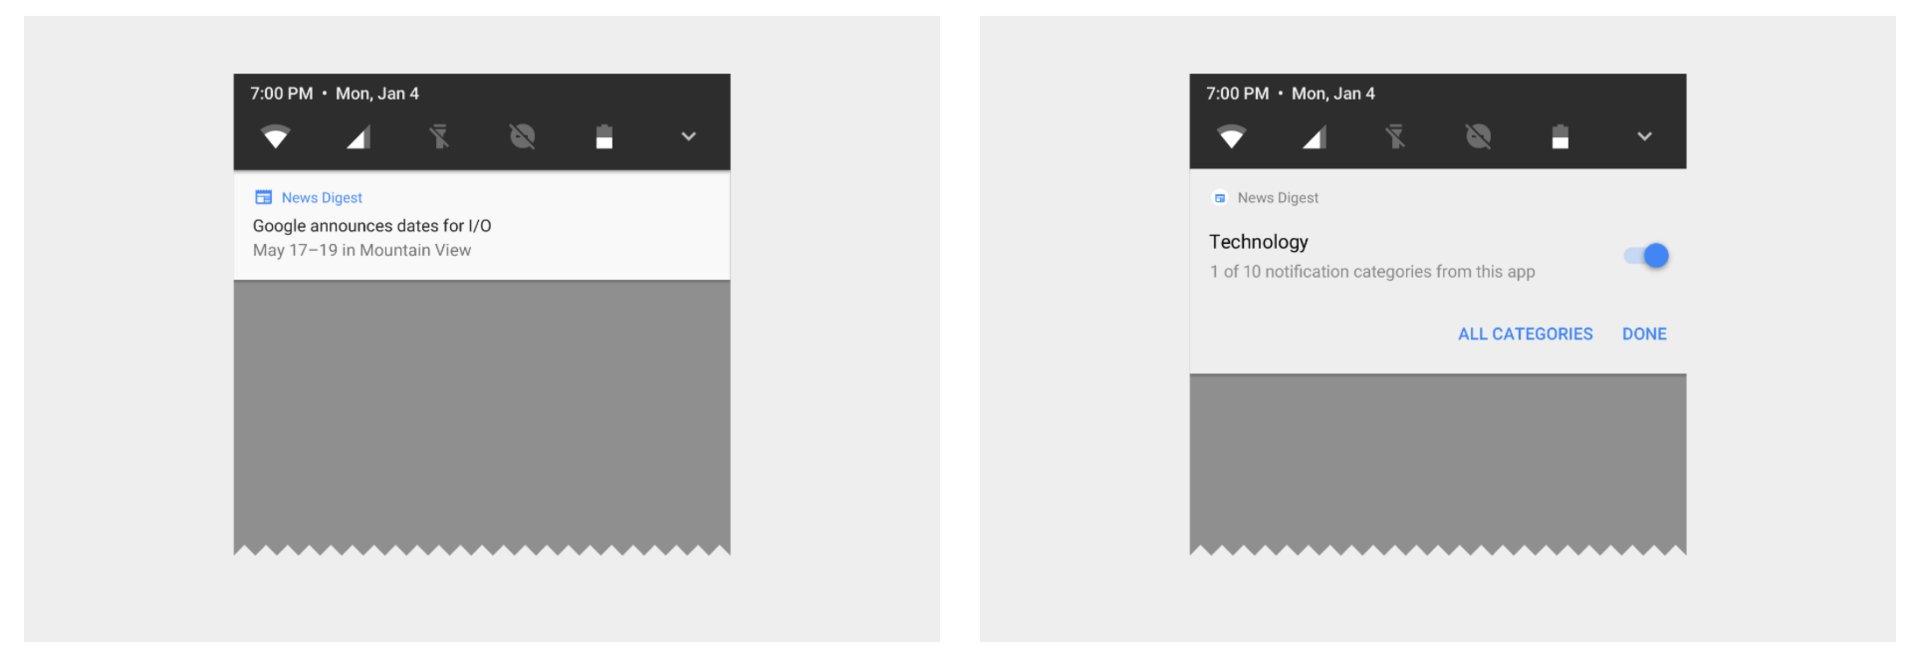 Notifications lassen sich Kategorien zuordnen (rechts)